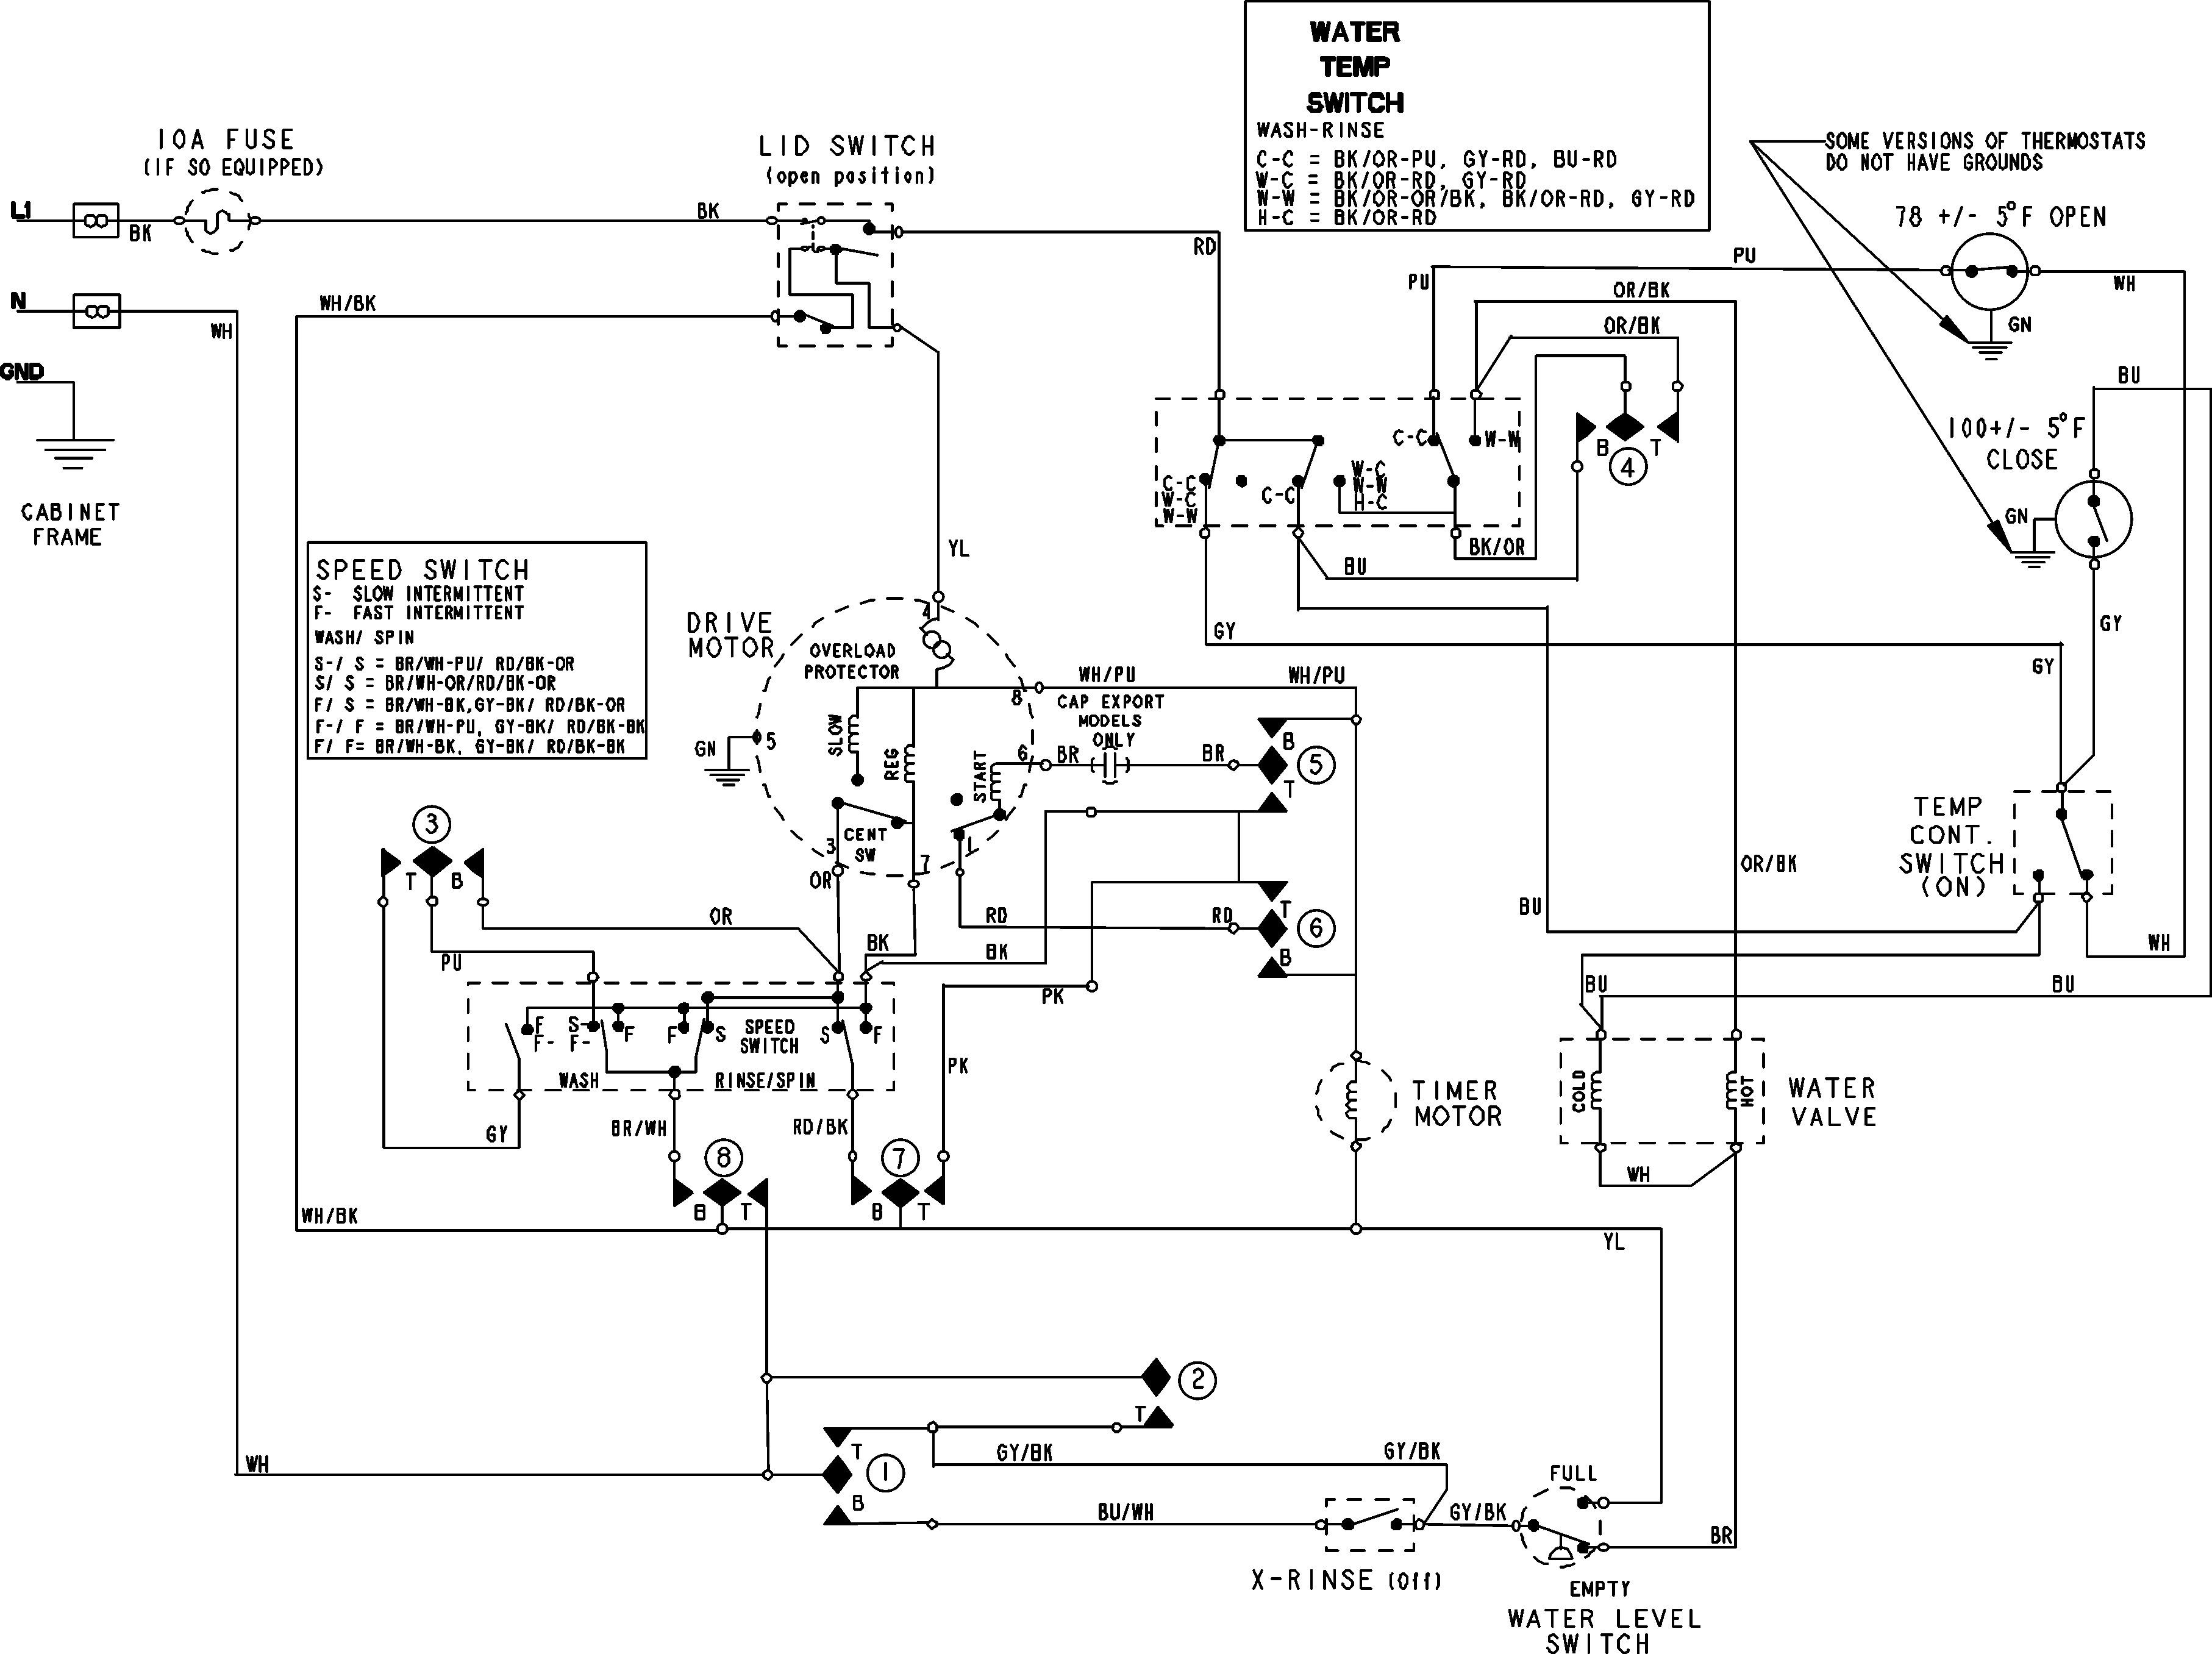 Maytag M460 G Dryer Wiring Diagram Wiring Diagram on engine model, battery model, parts model, ford model, system model, cabinet model, motor model,